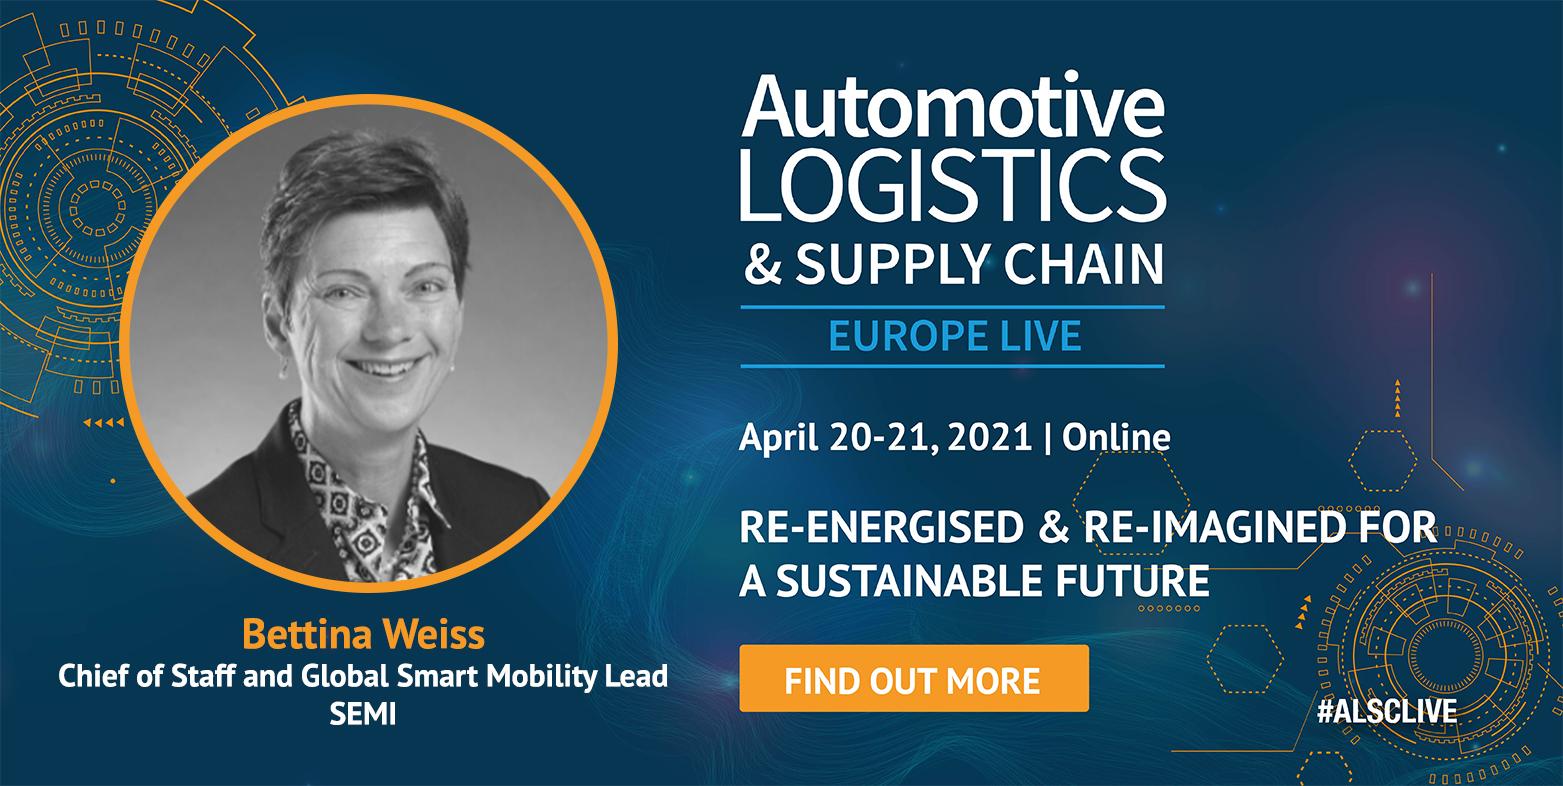 Bettina Automotive Logistics